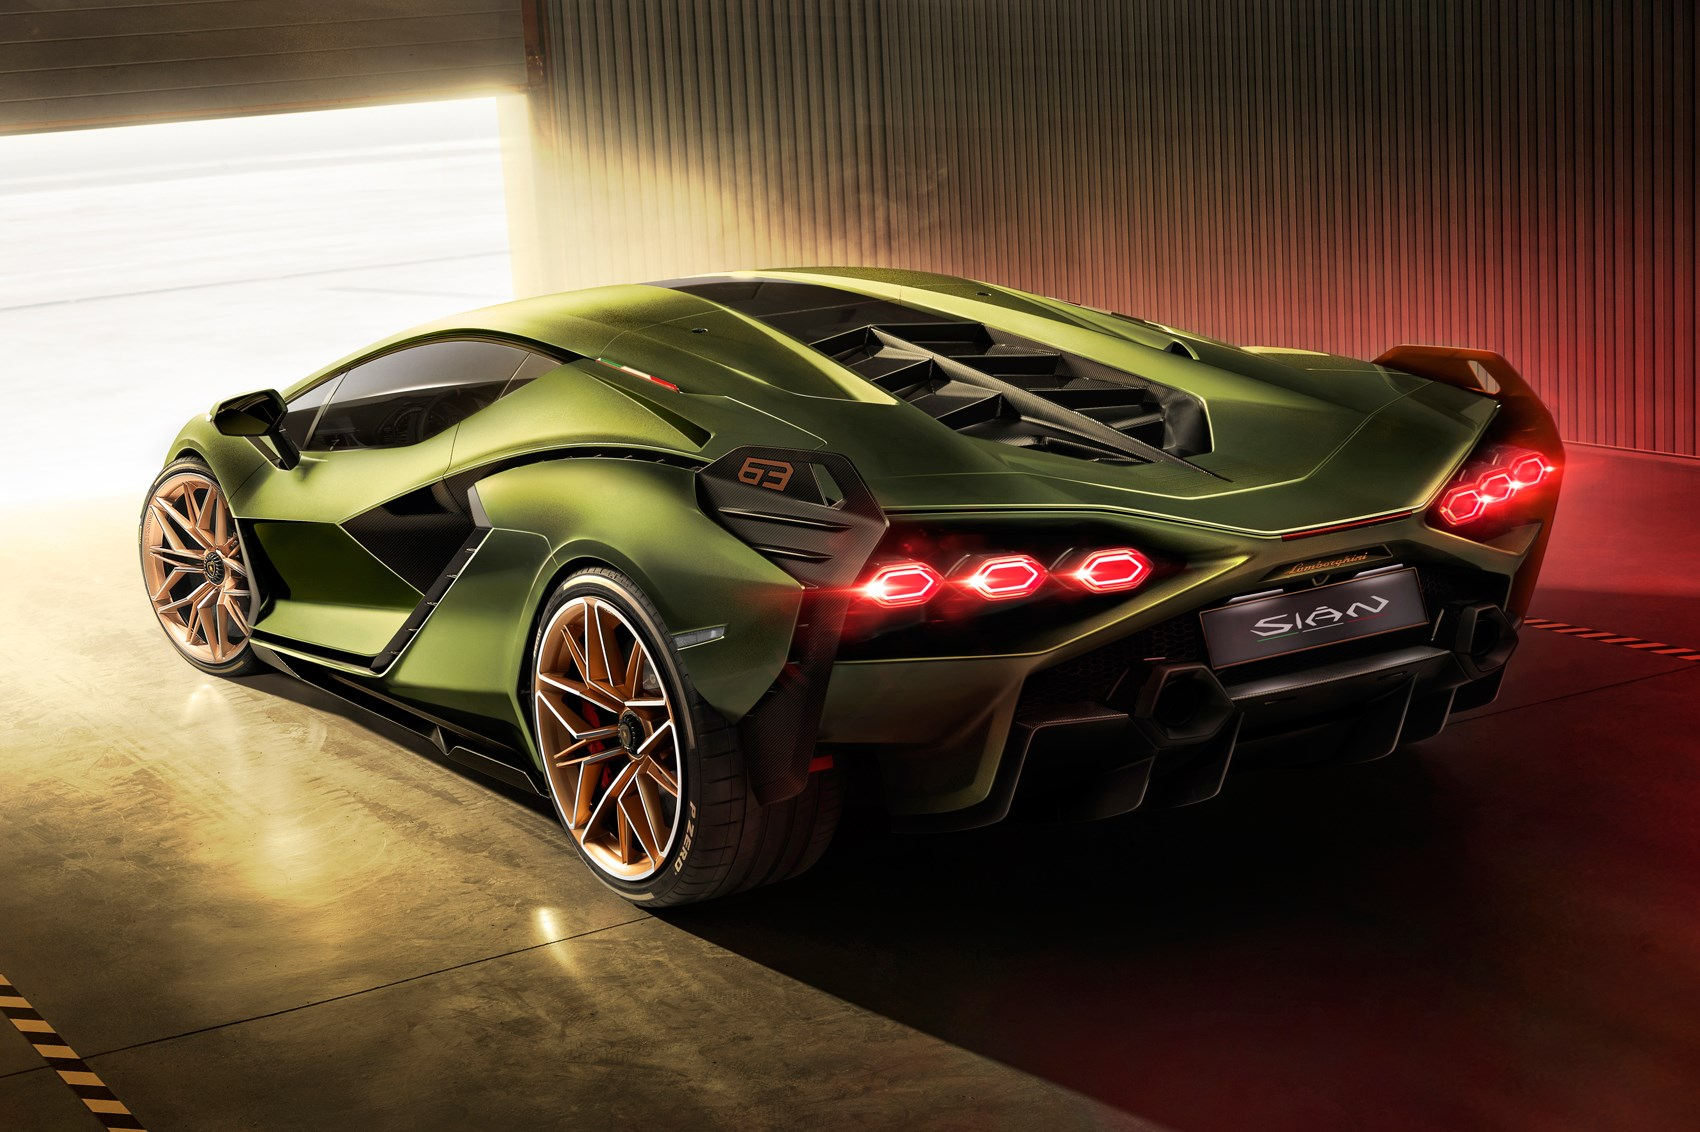 New Lamborghini Sian First hybrid Lambo revealed at